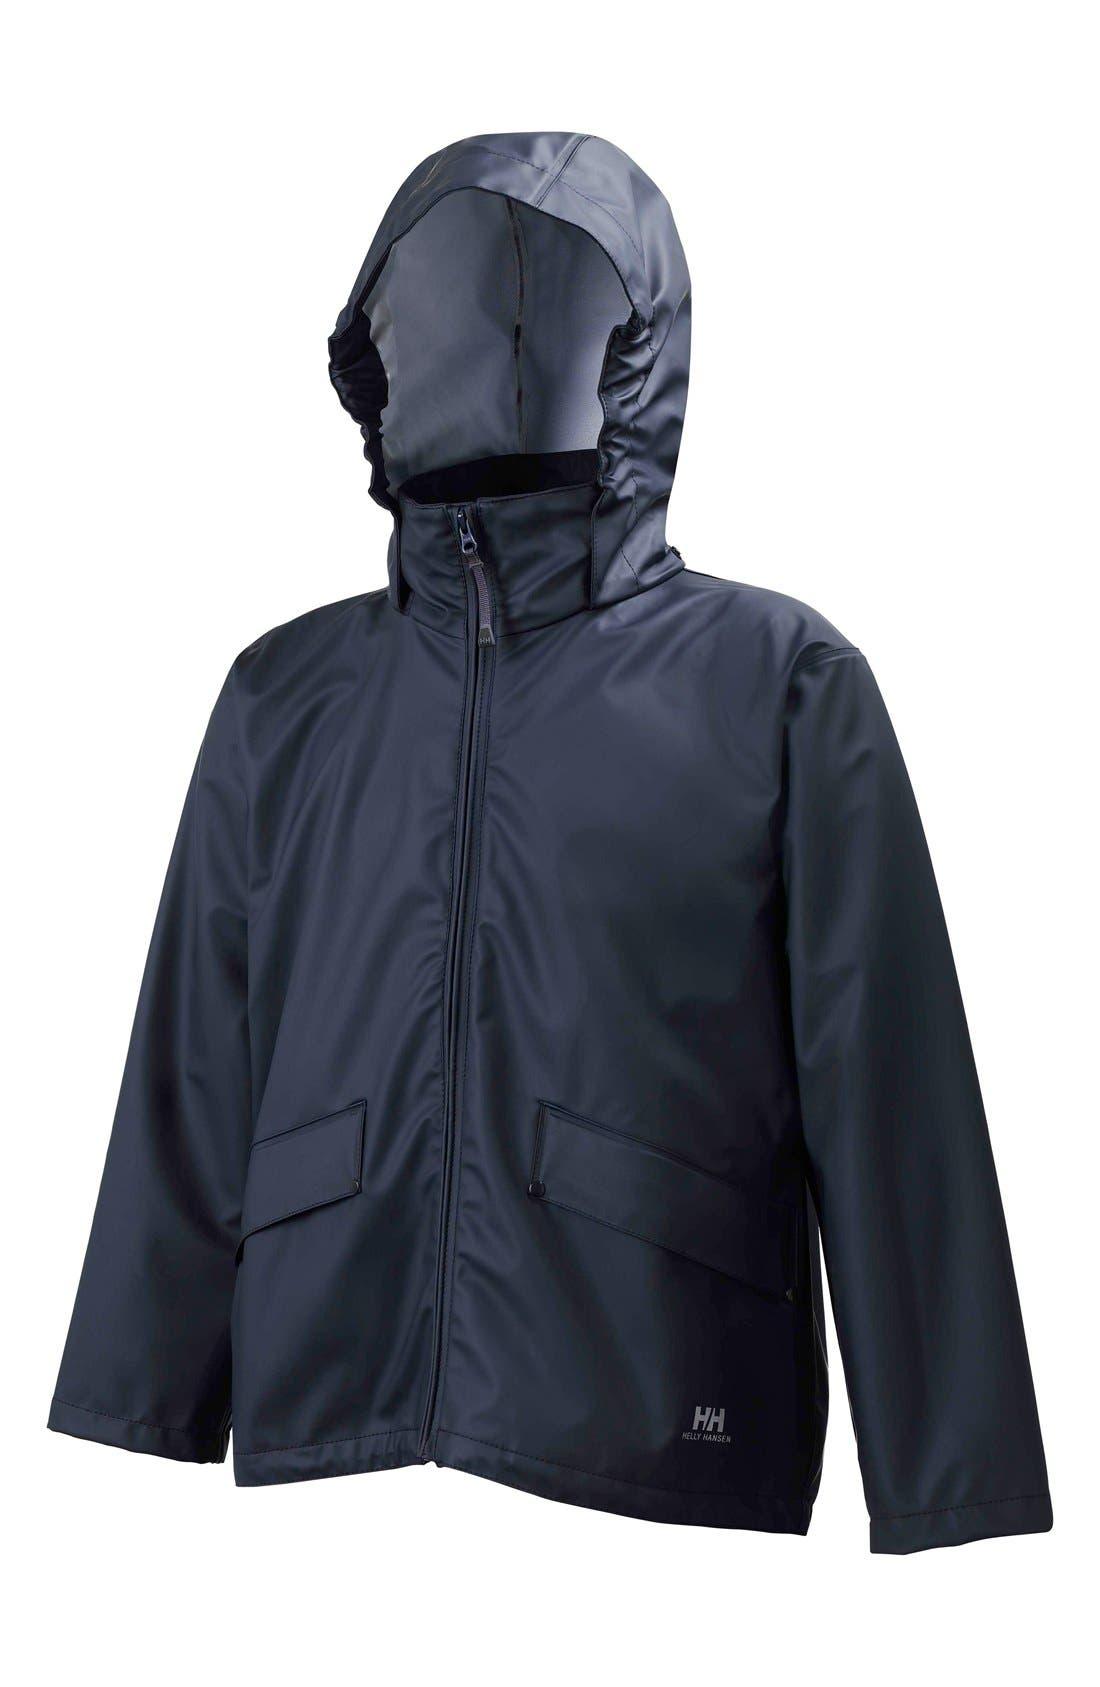 Main Image - Helly Hansen Jr. Voss Waterproof Rain Jacket (Big Boys)